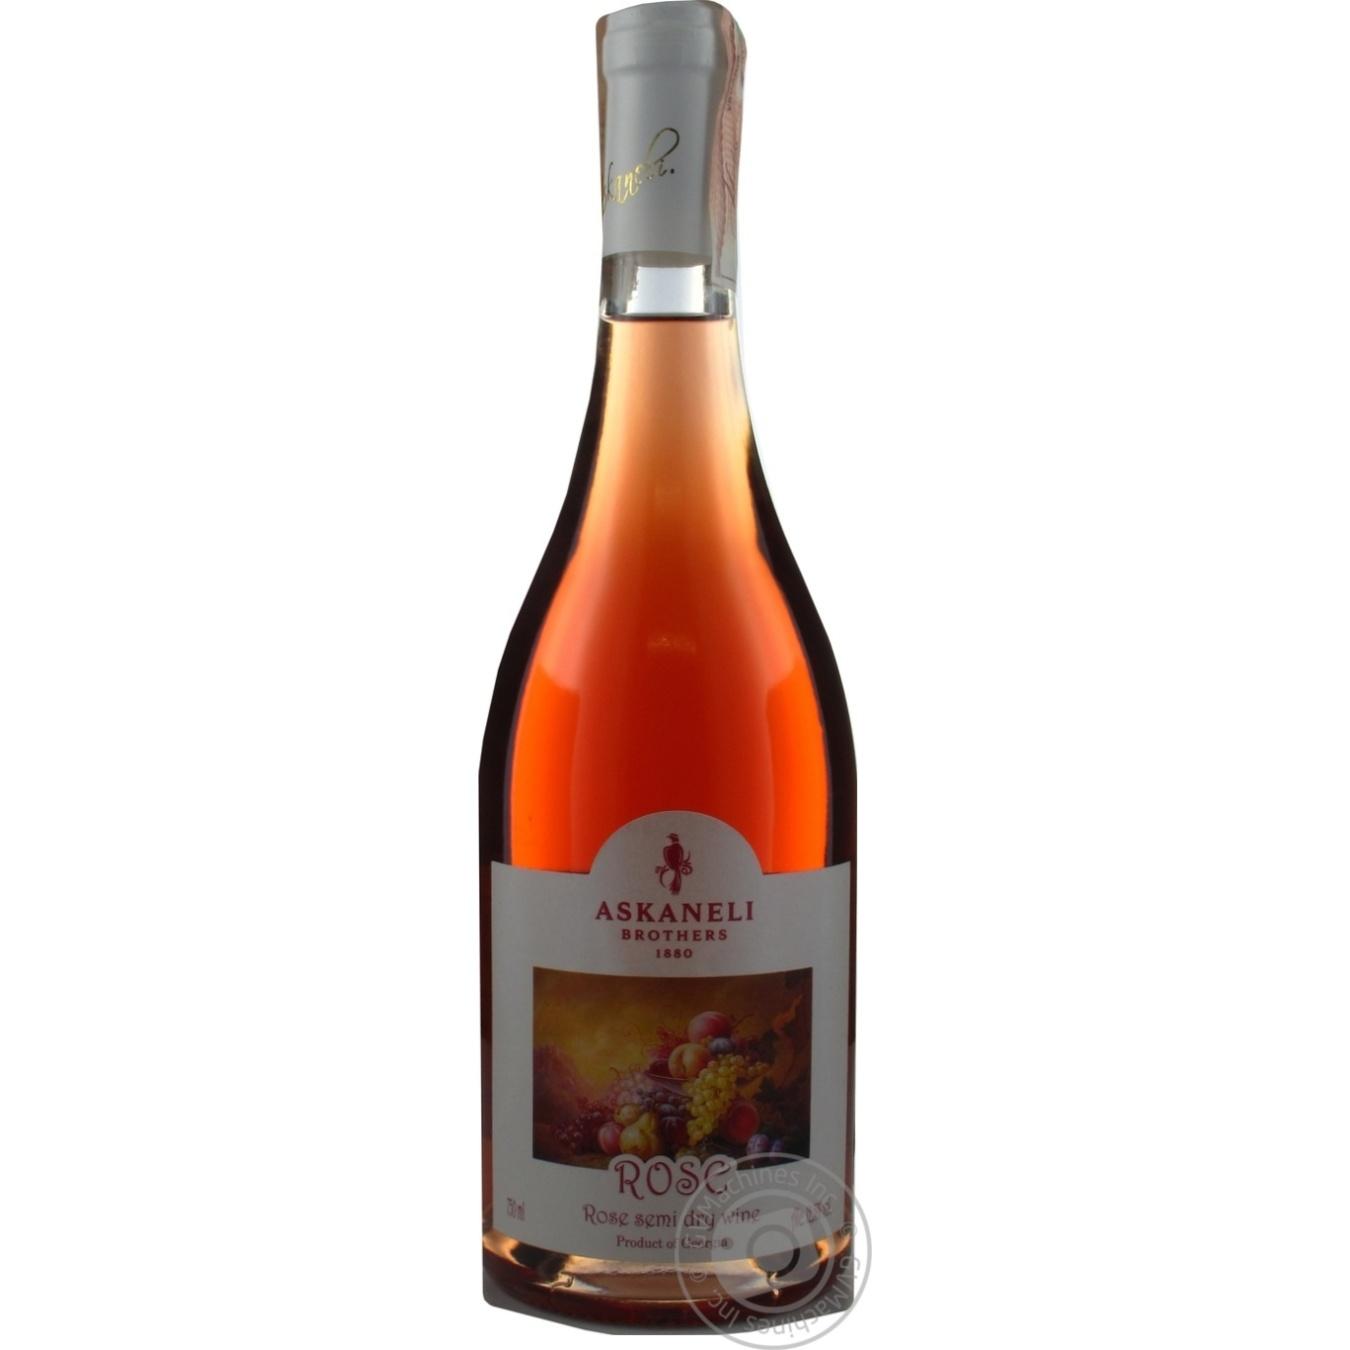 Вино Askaneli Brothers Rose рожеве напівсухе 12,5% 0,75л